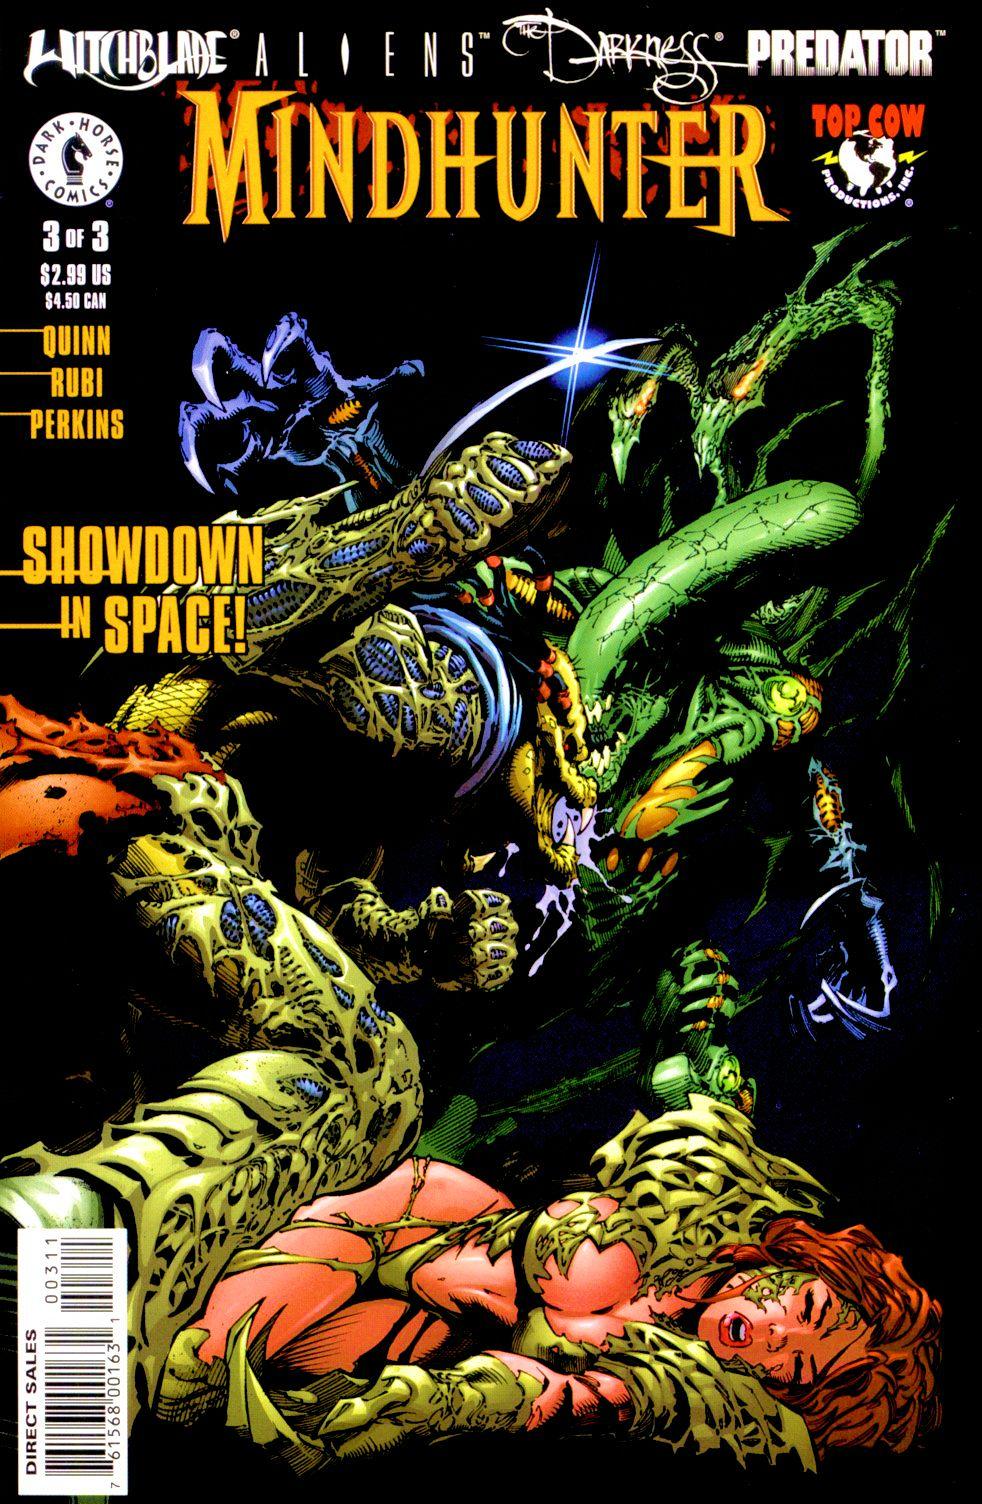 Witchblade/Aliens/The Darkness/Predator: Mindhunter 3 Page 1